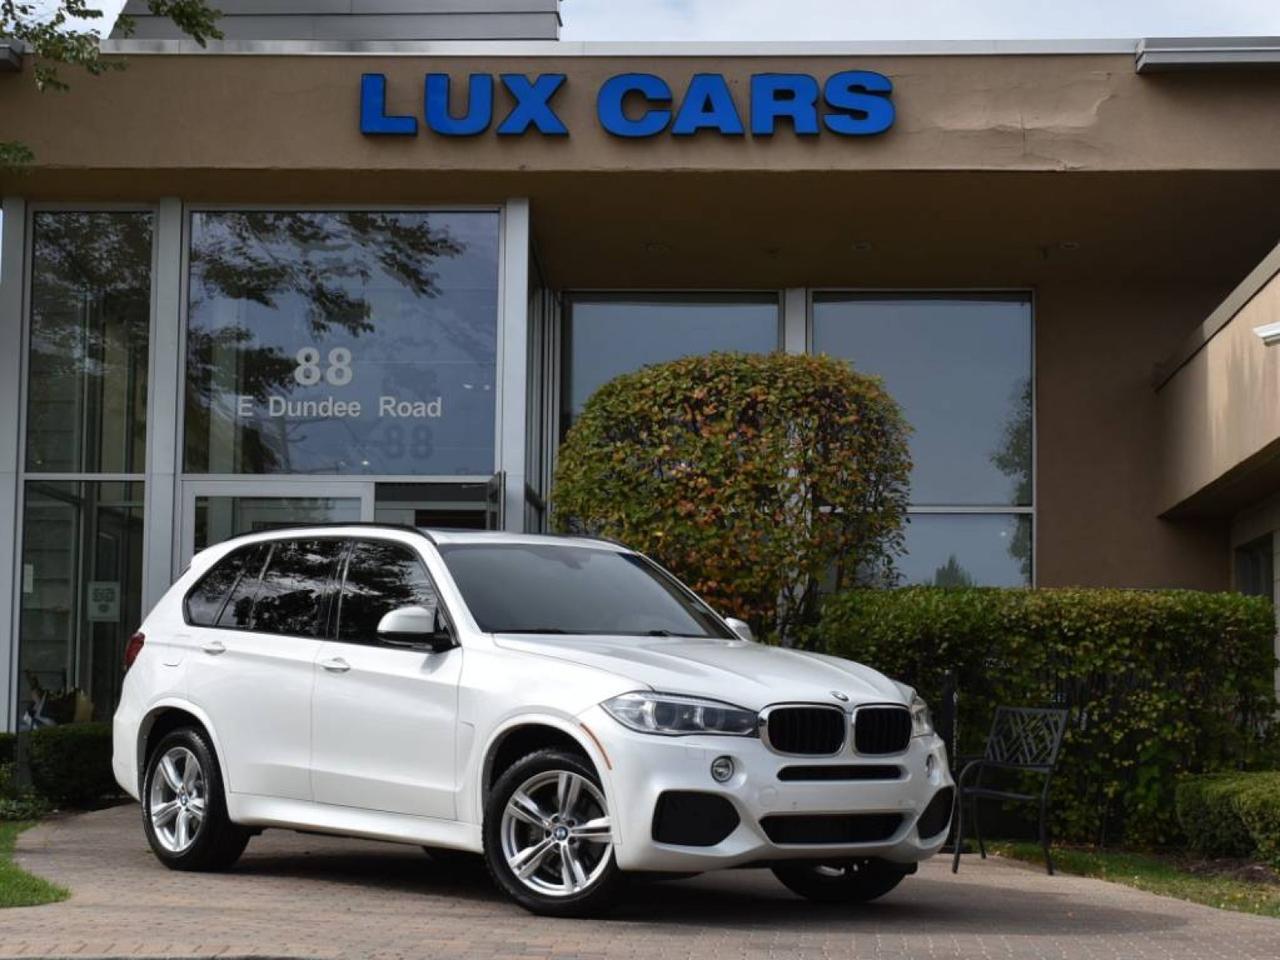 2014 BMW X5 xDrive35i M-Sport Panoroof Nav AWD $69,150 Buffalo Grove IL